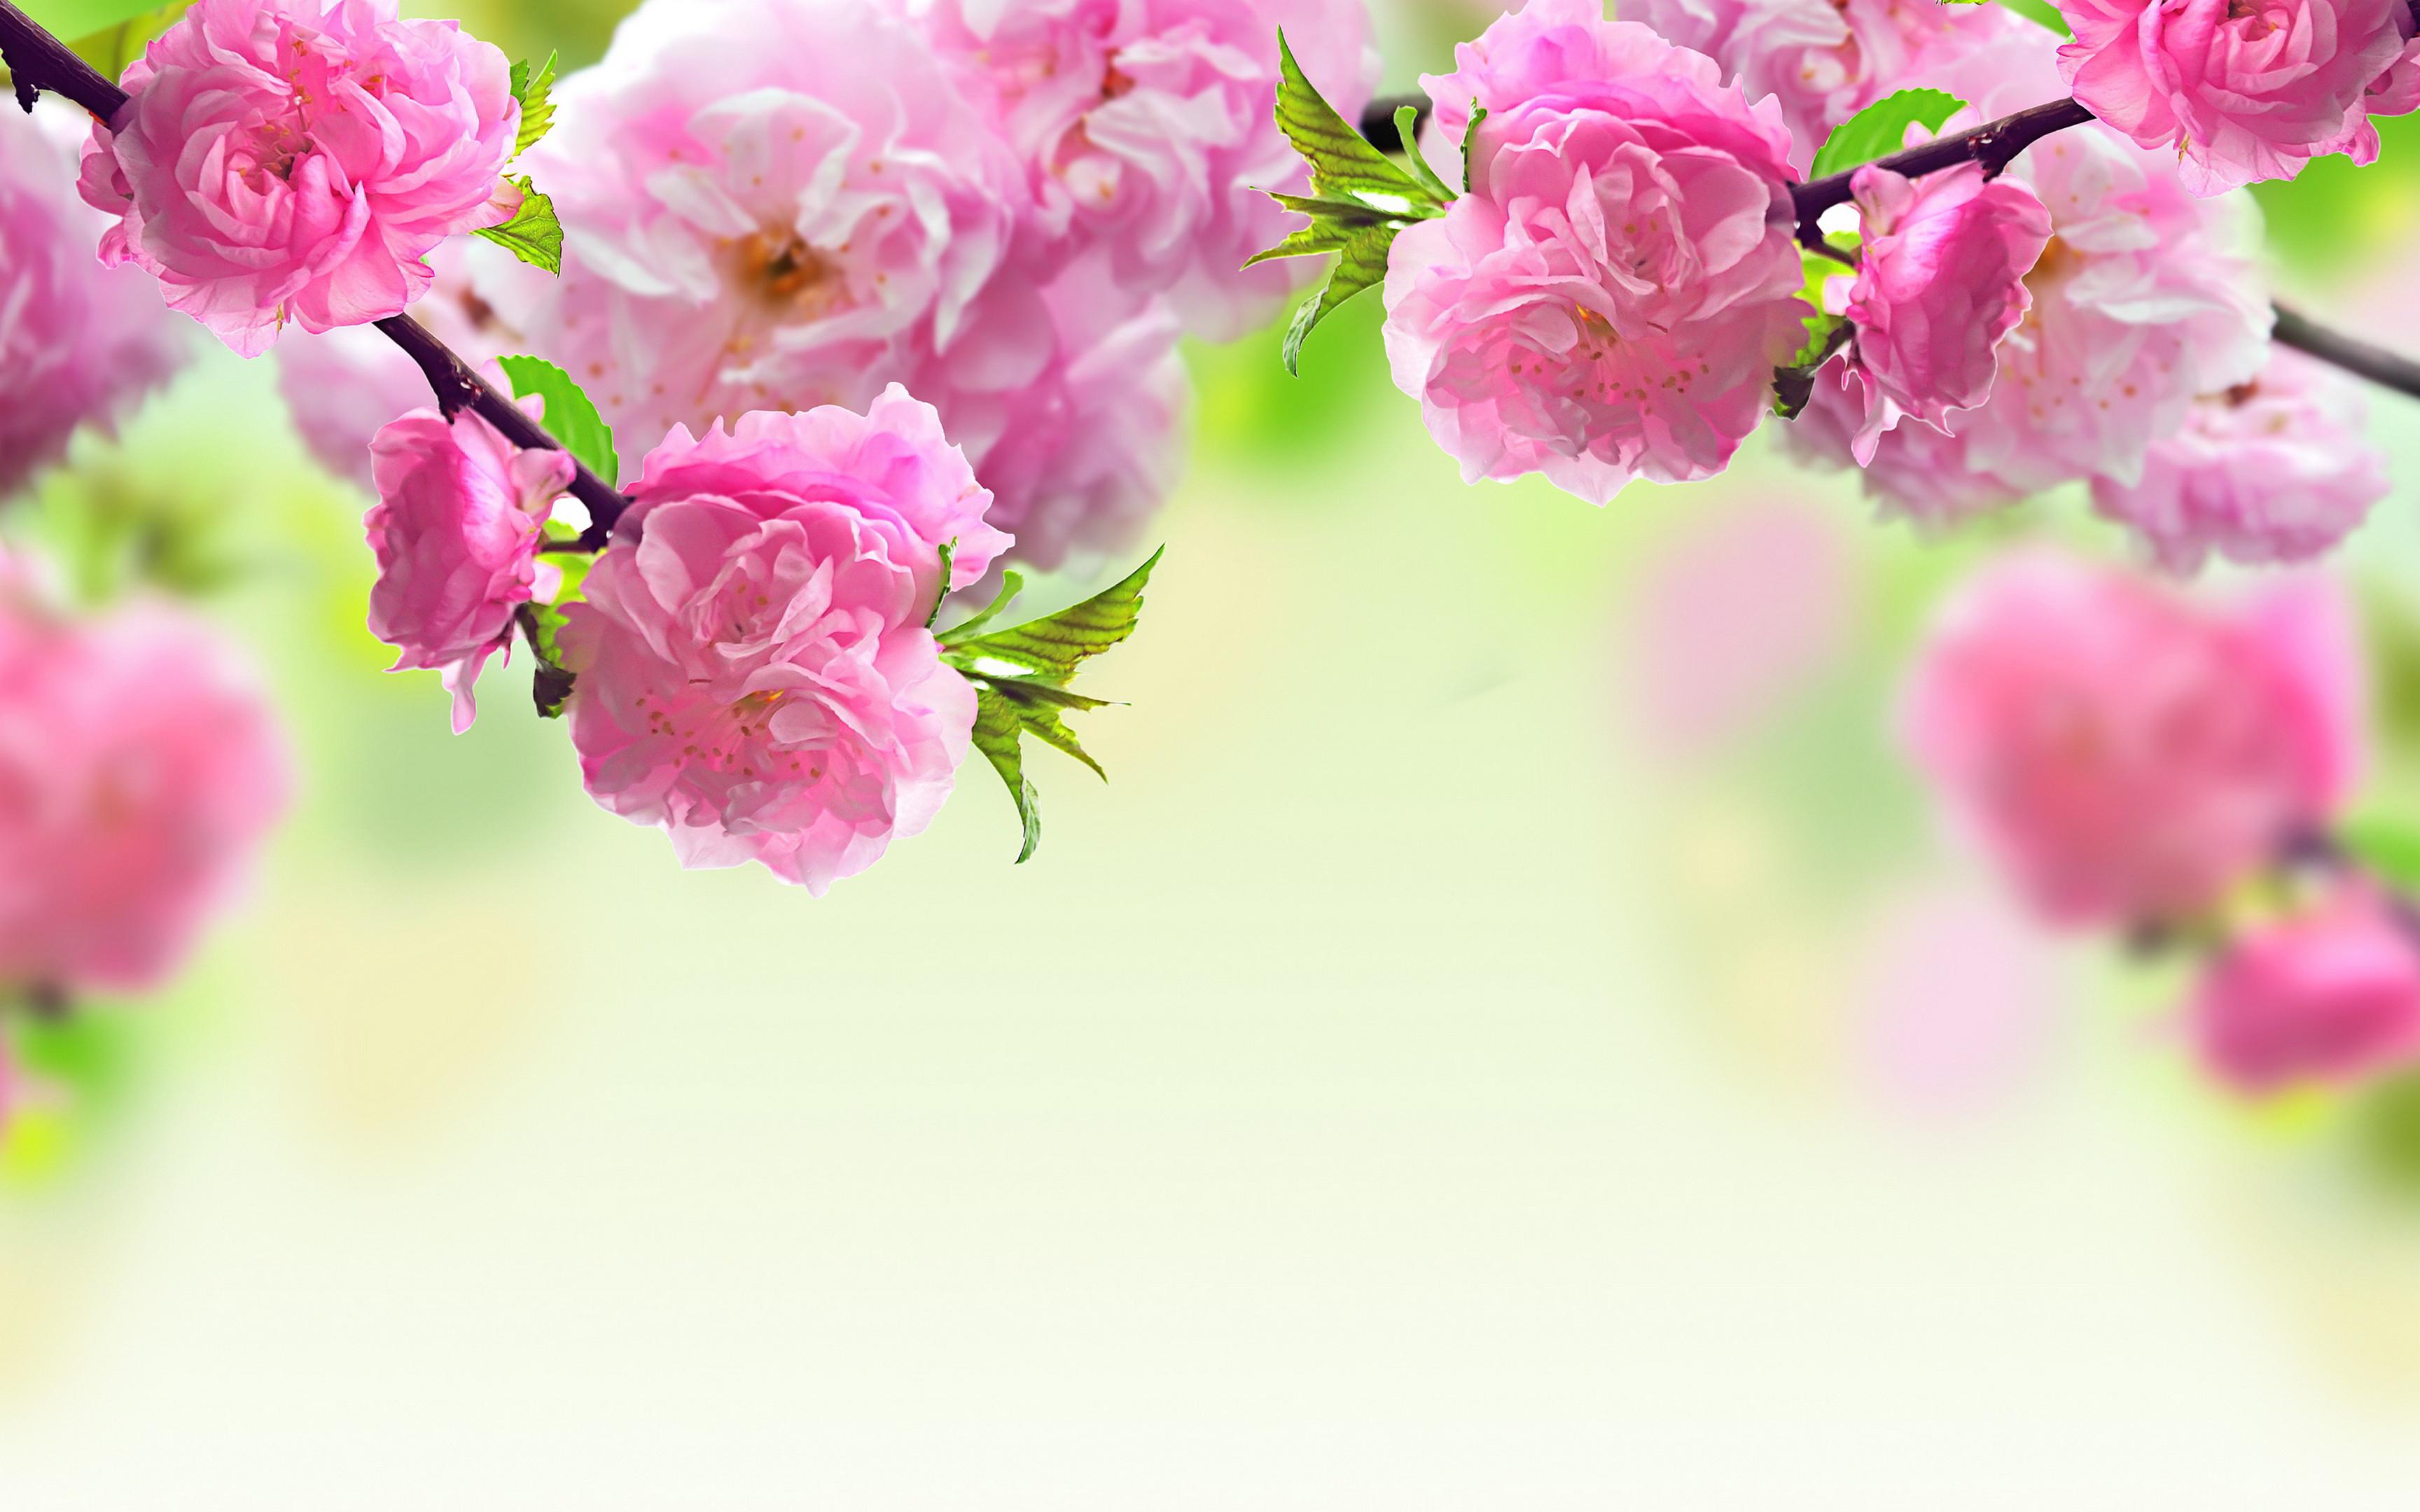 MACRO wallpaper   Pink Spring Flowers Macro Wallpaper HD Free Desktop  #429003773